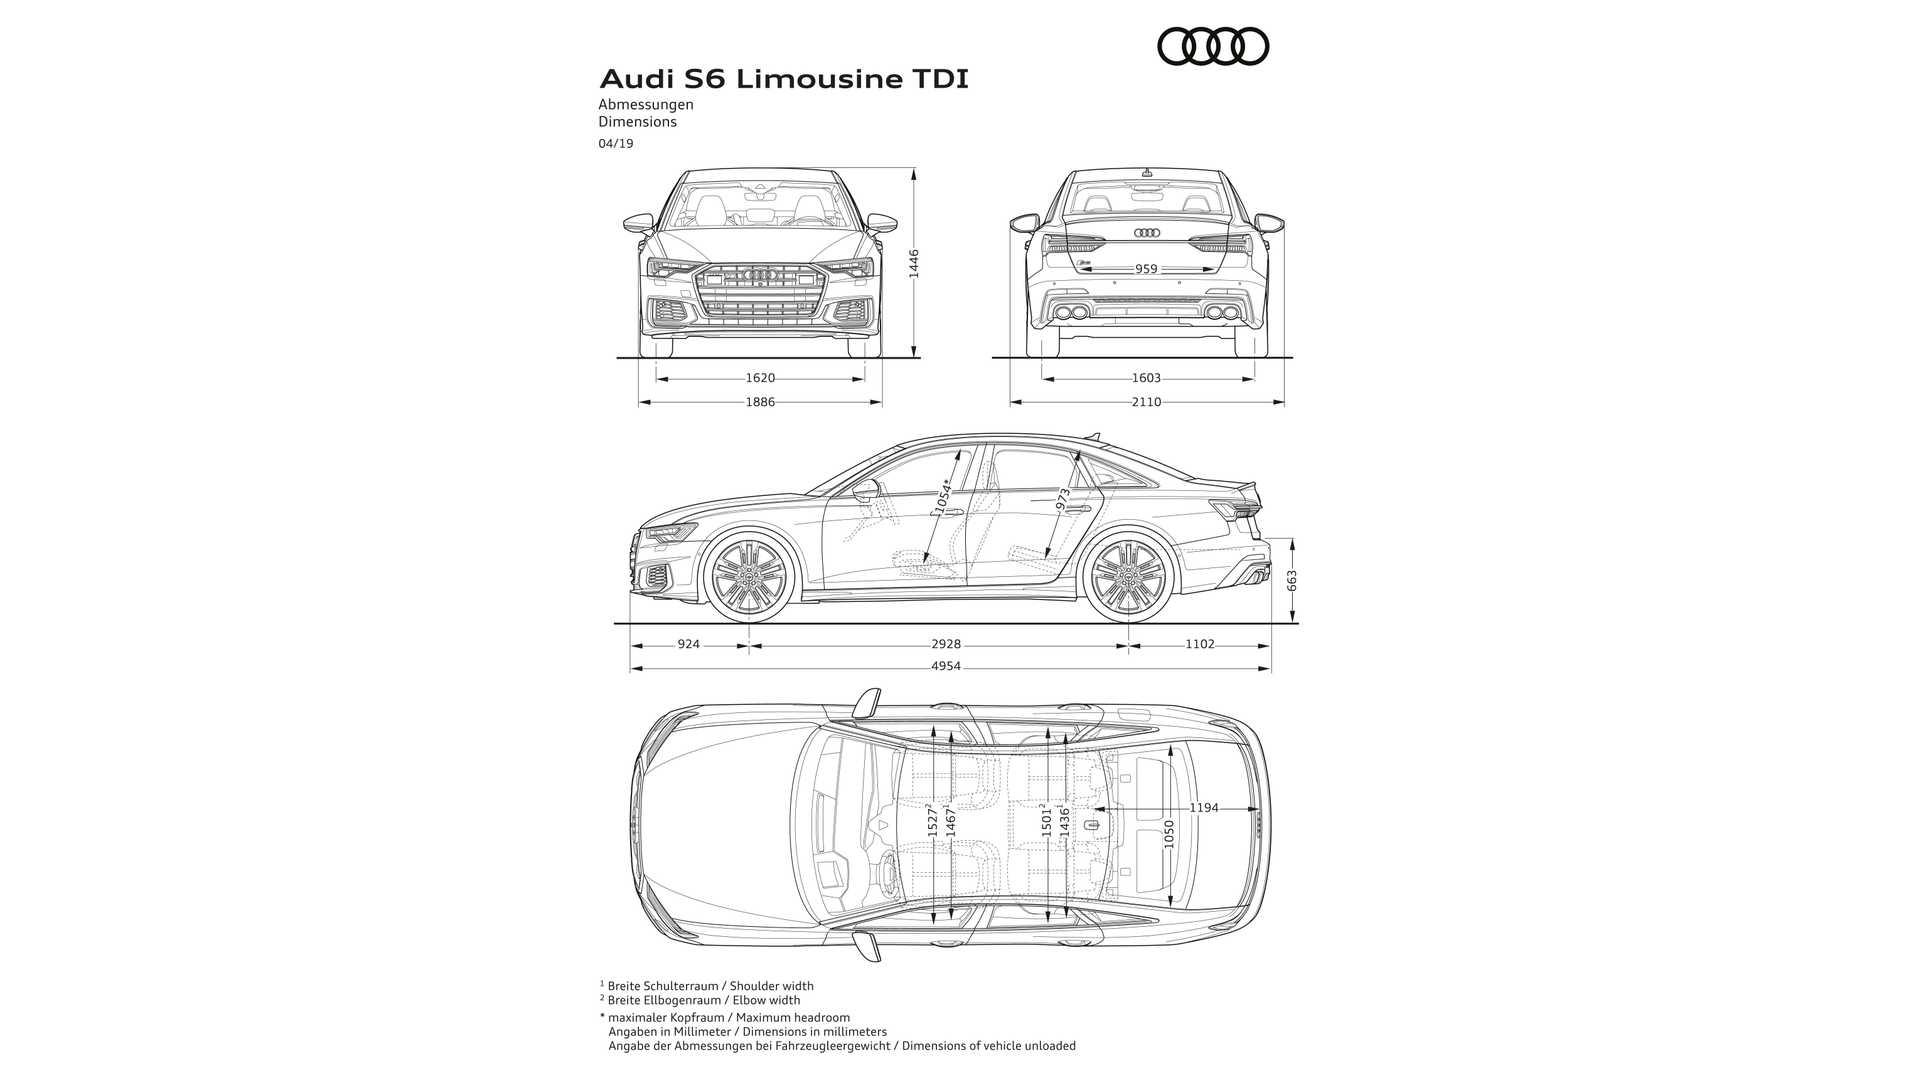 2020-audi-s6-sedan-tdi (13).jpg